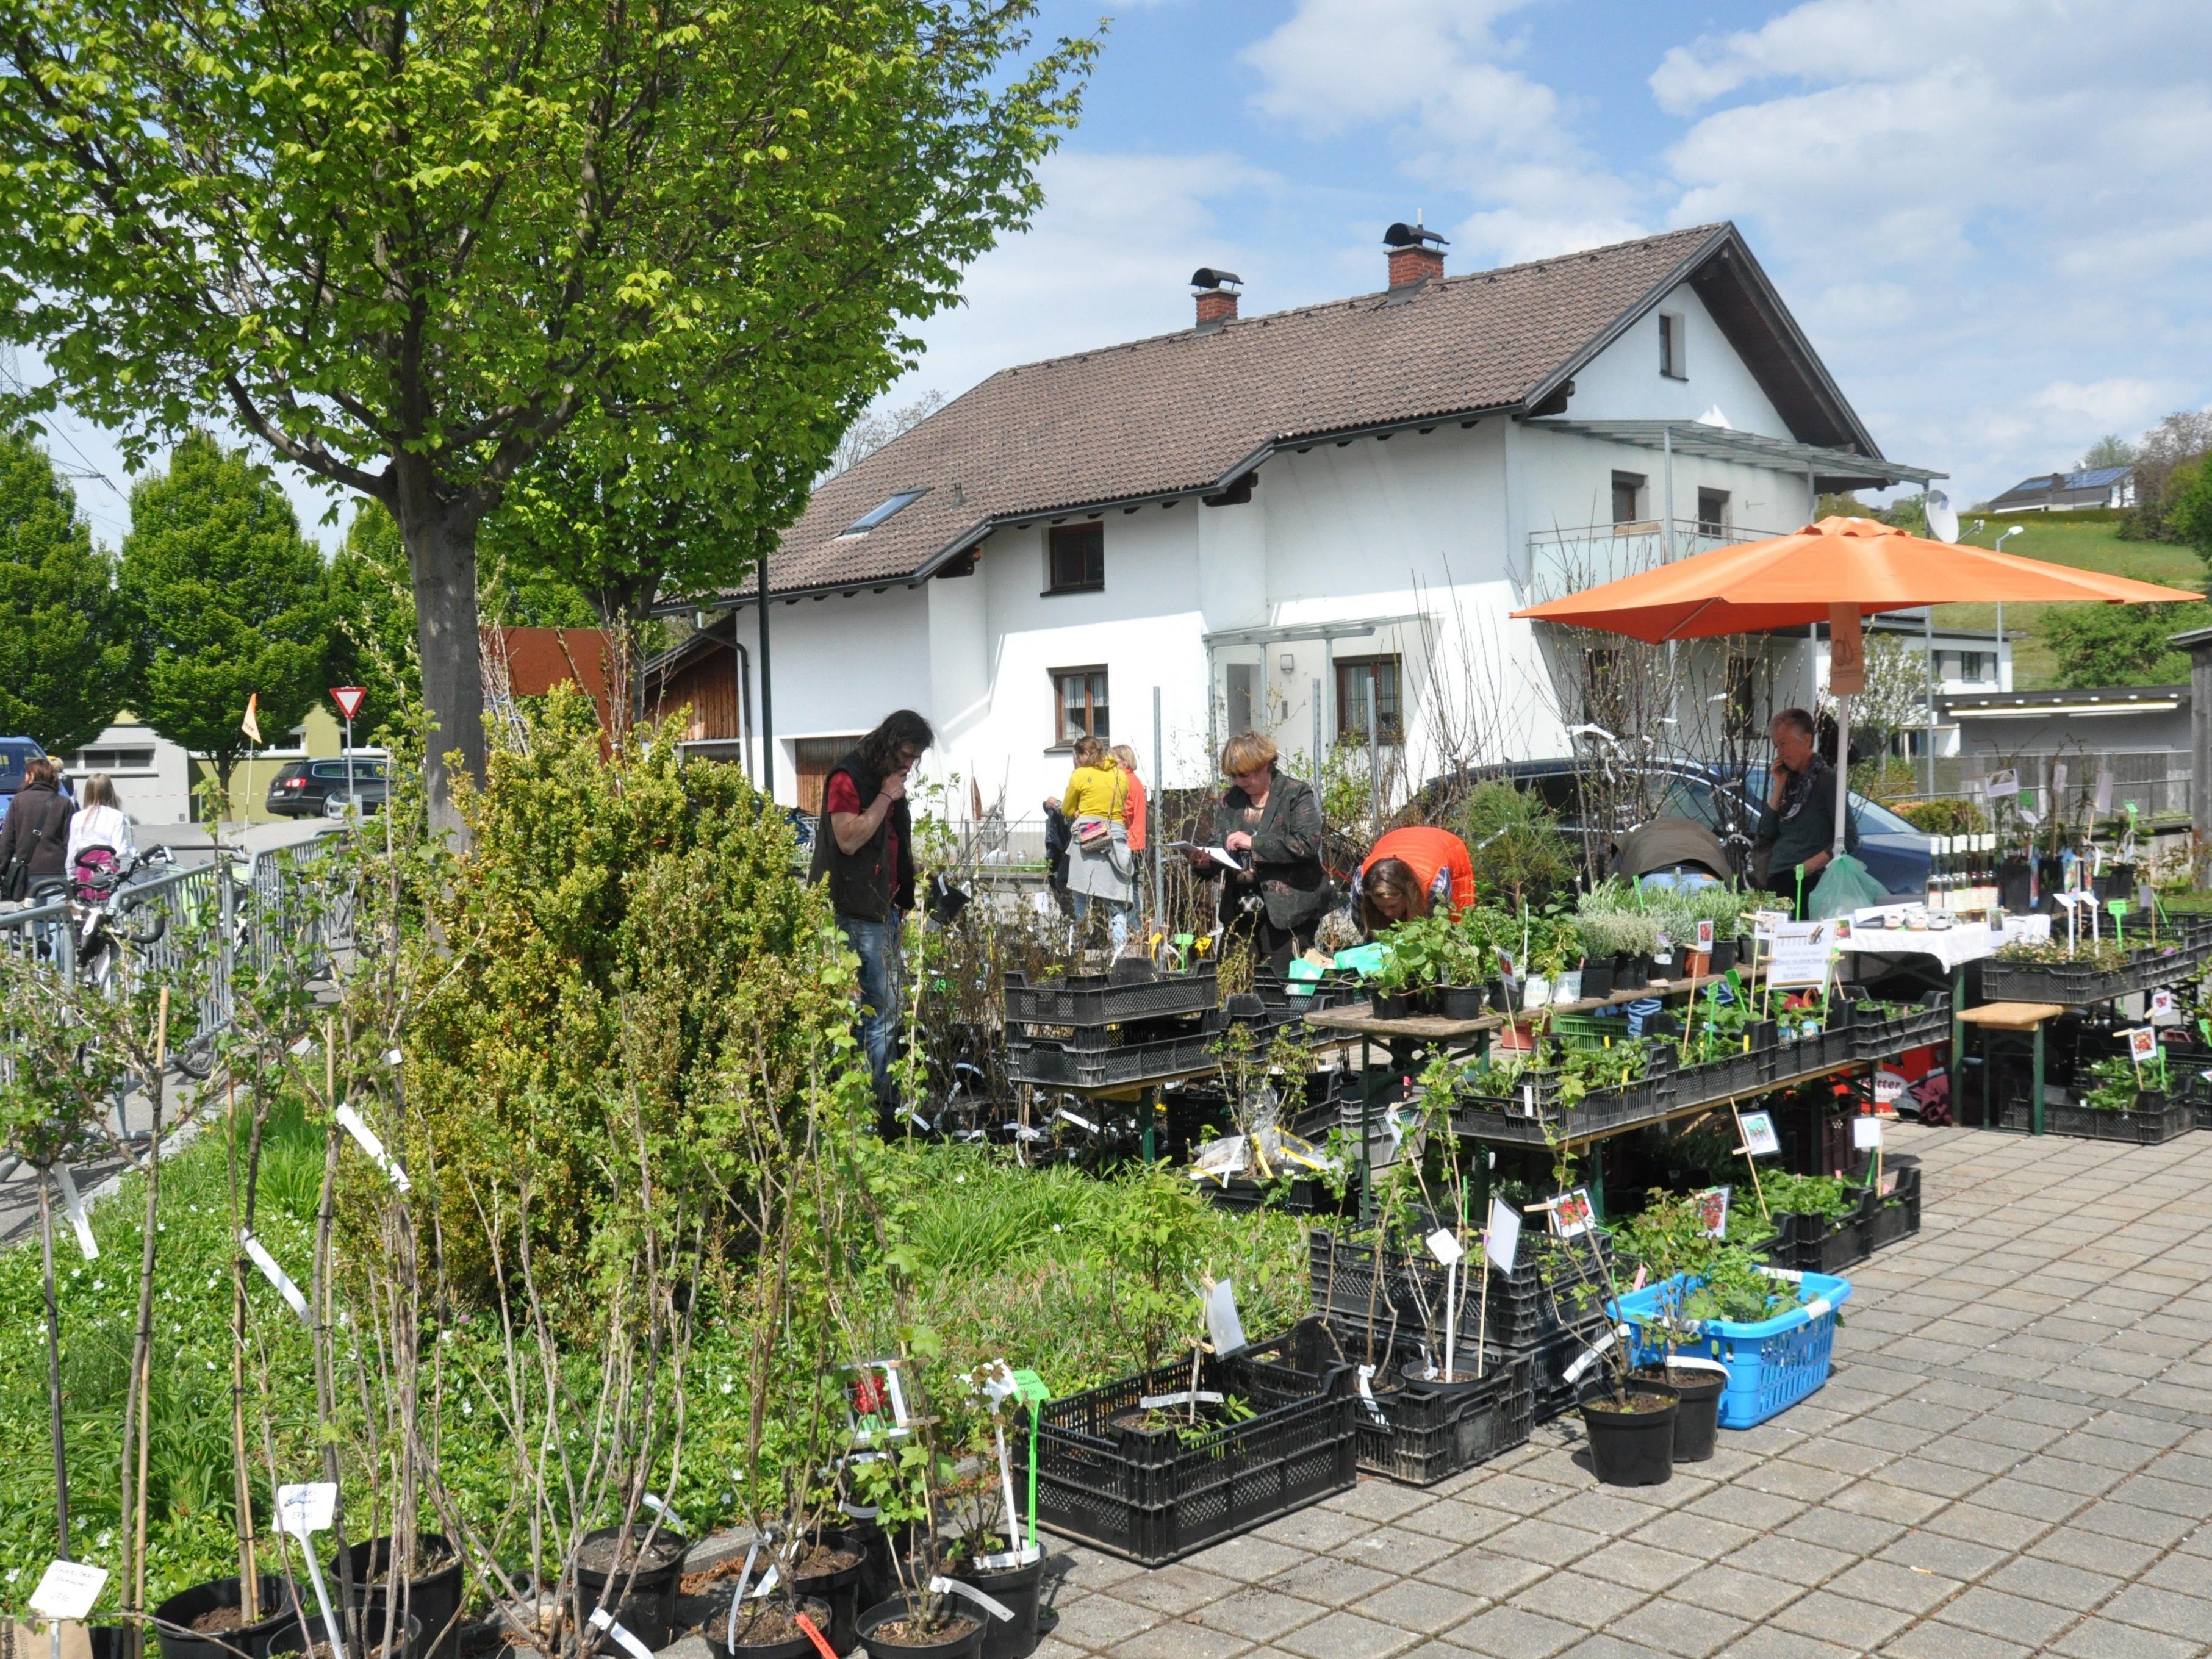 Arche Noah Markt 2016